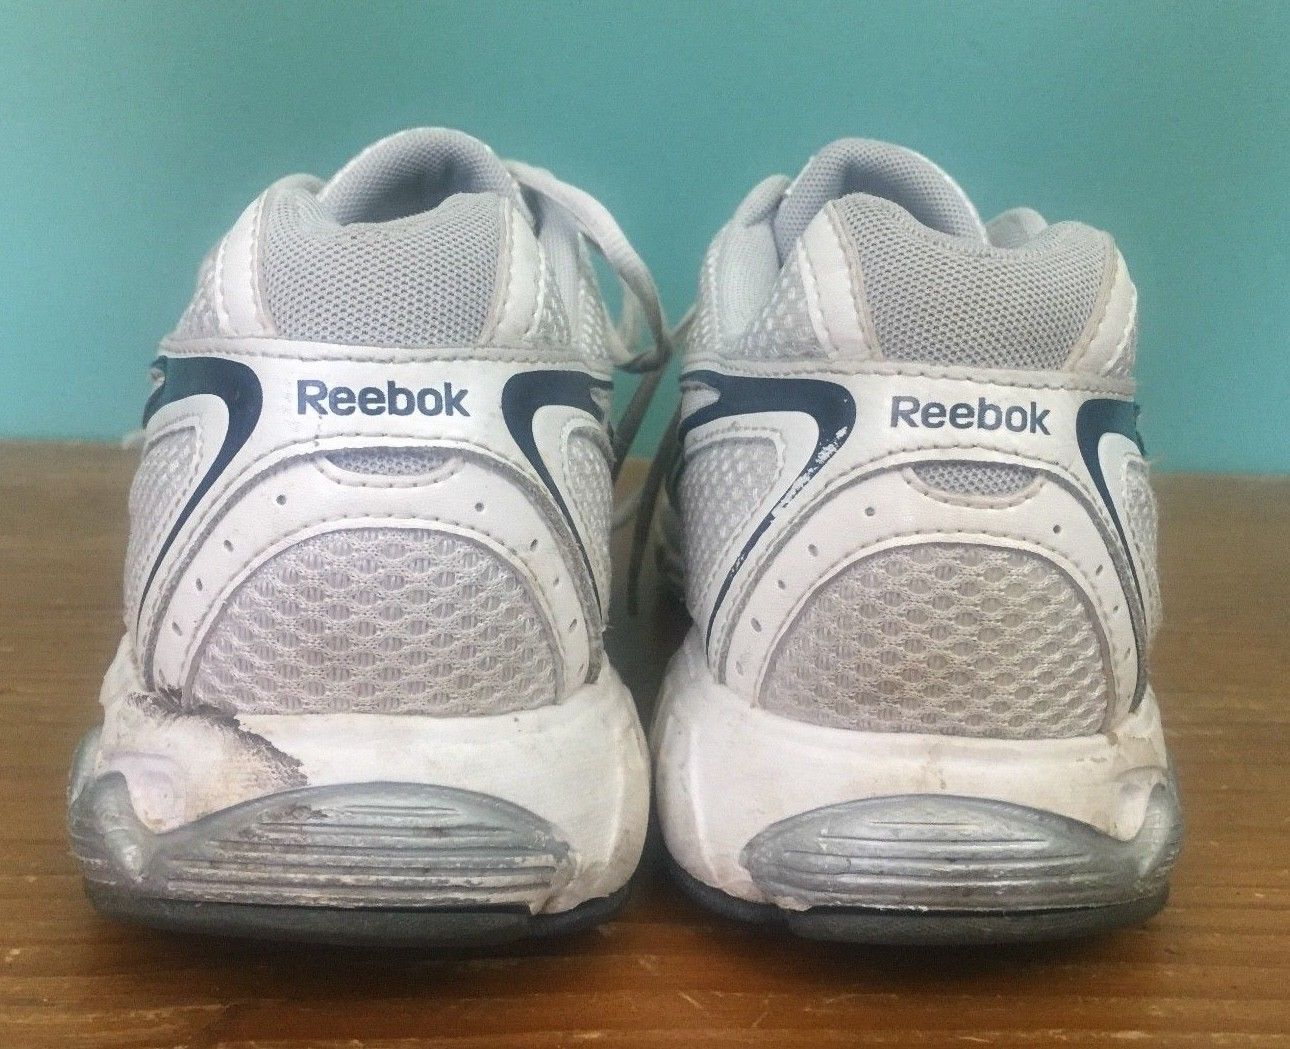 new style 3c824 5f6dd ... Reebok Men s Walking Shoes - Size 10.5 - White, Silver, ...